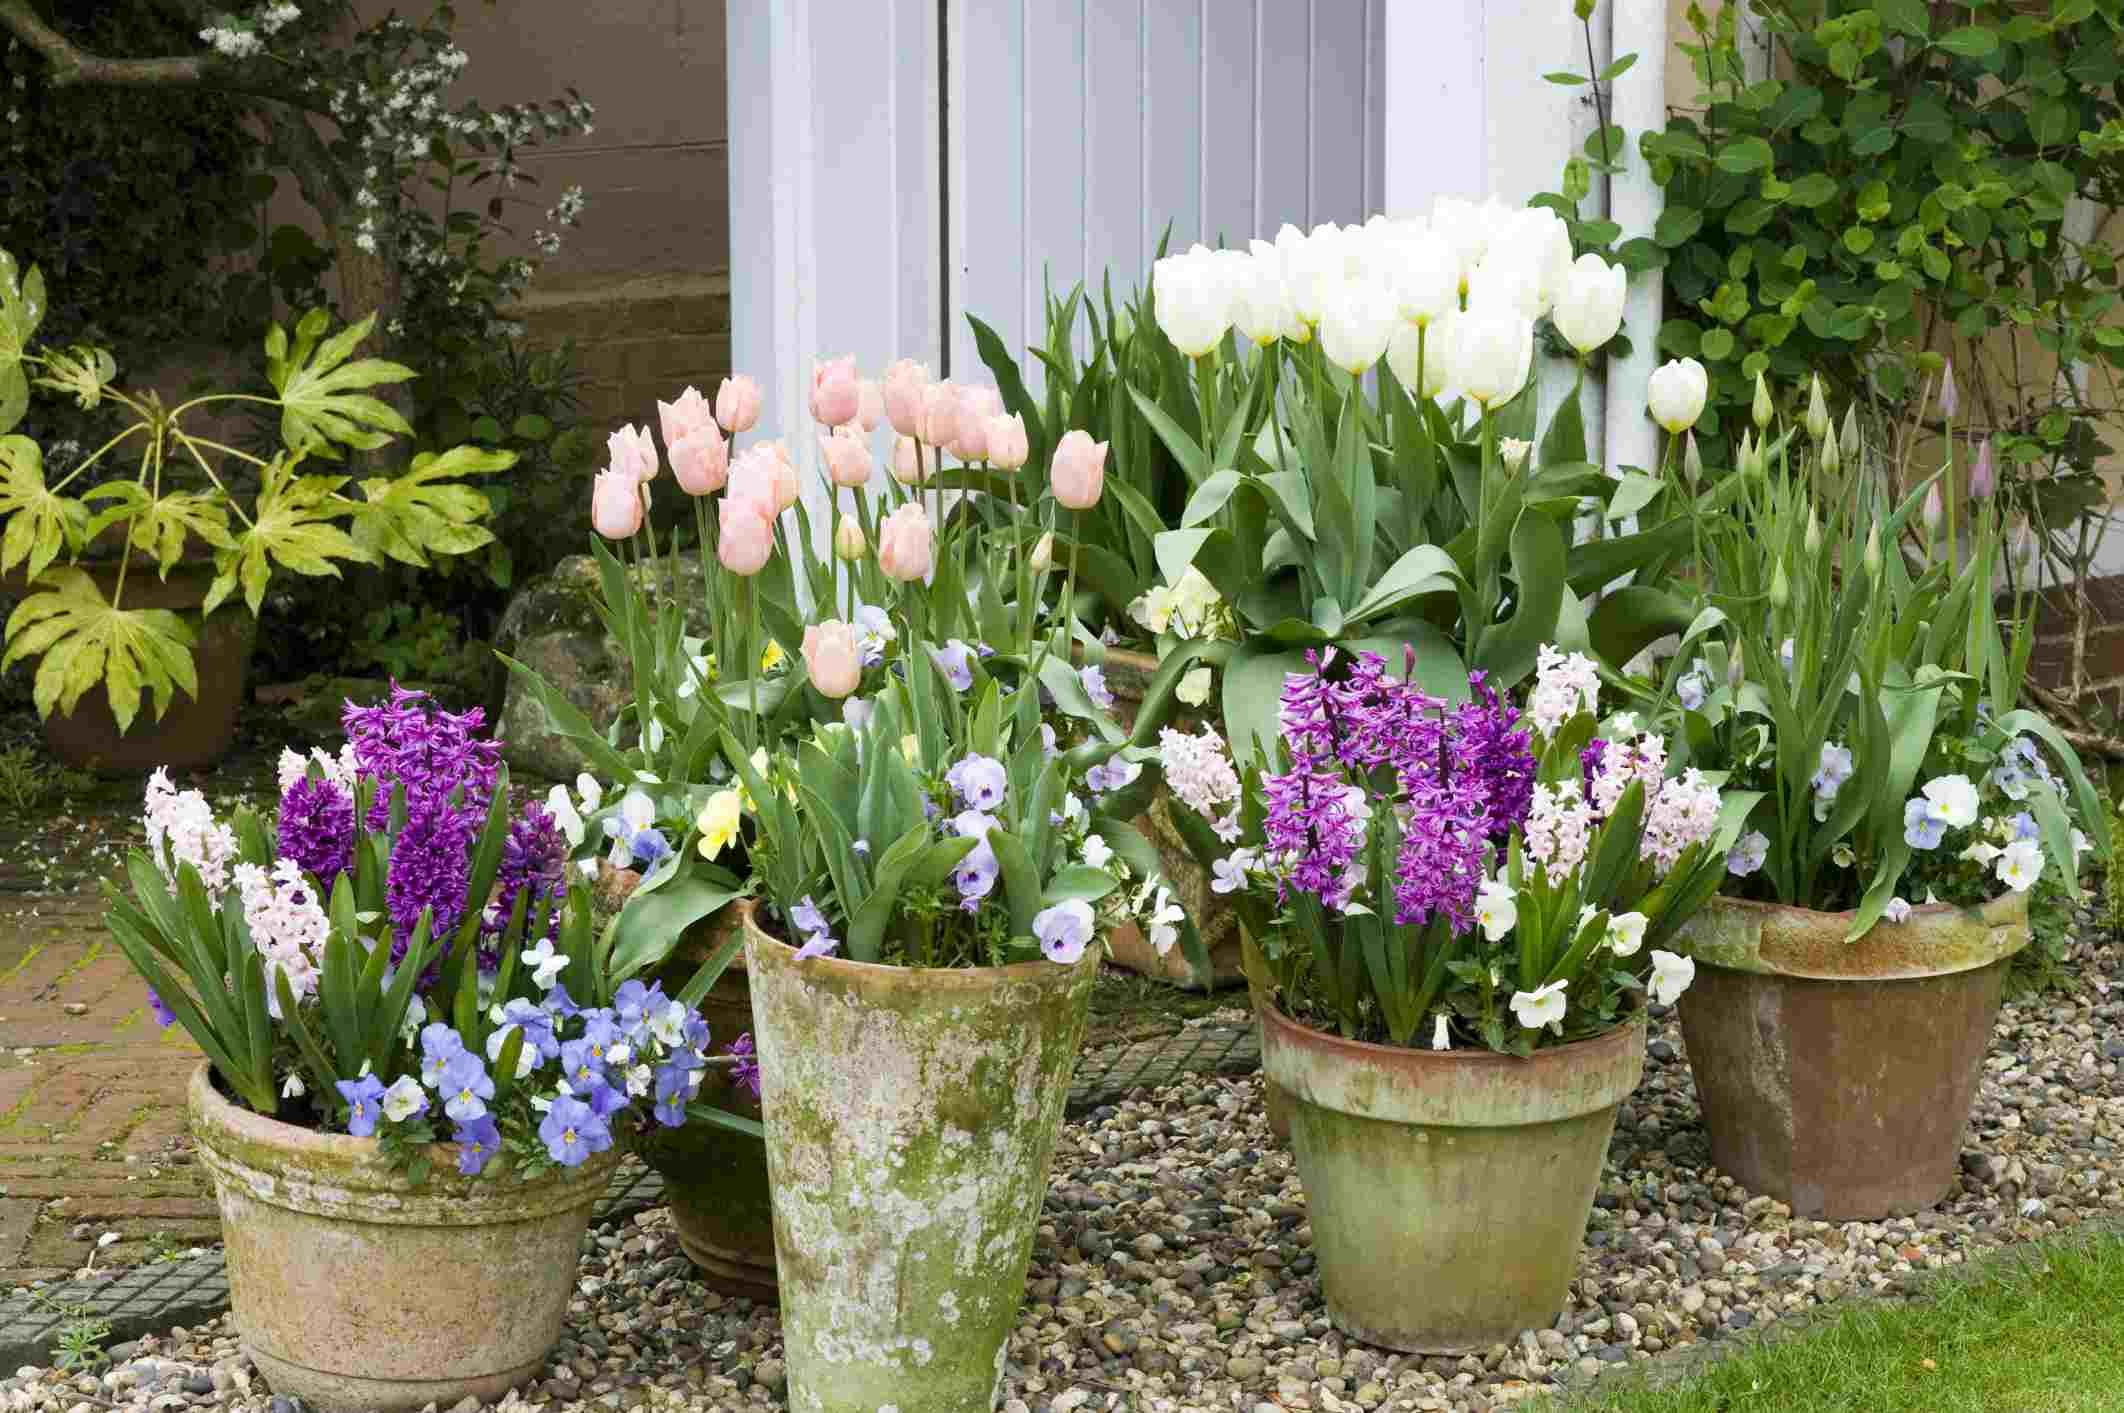 Spring Bulbs in Terracotta Pots